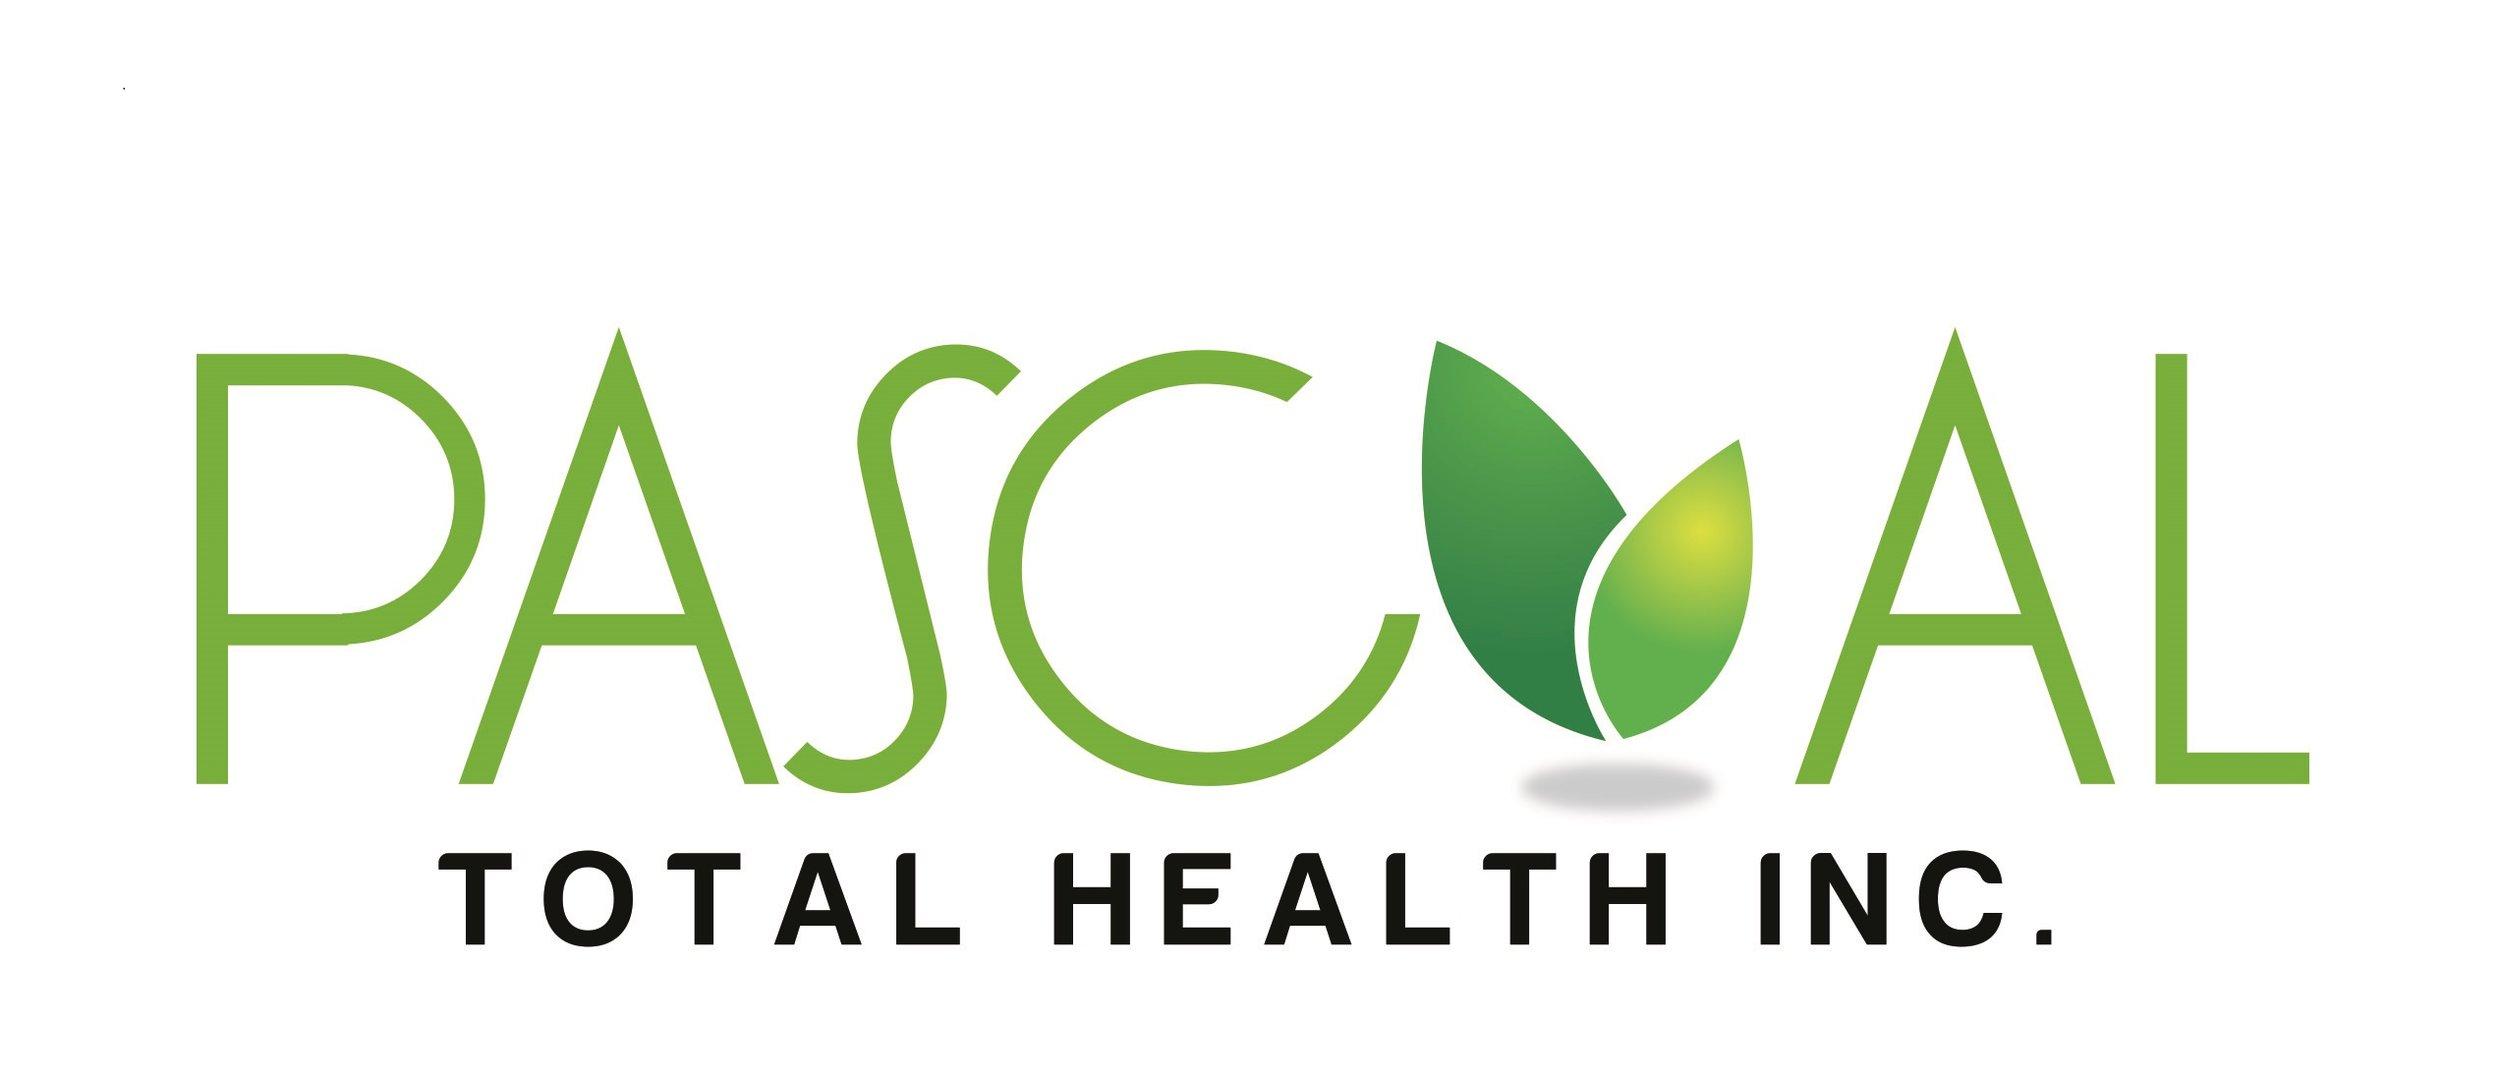 PASCUAL TOTAL HEALTH LOGO.jpg